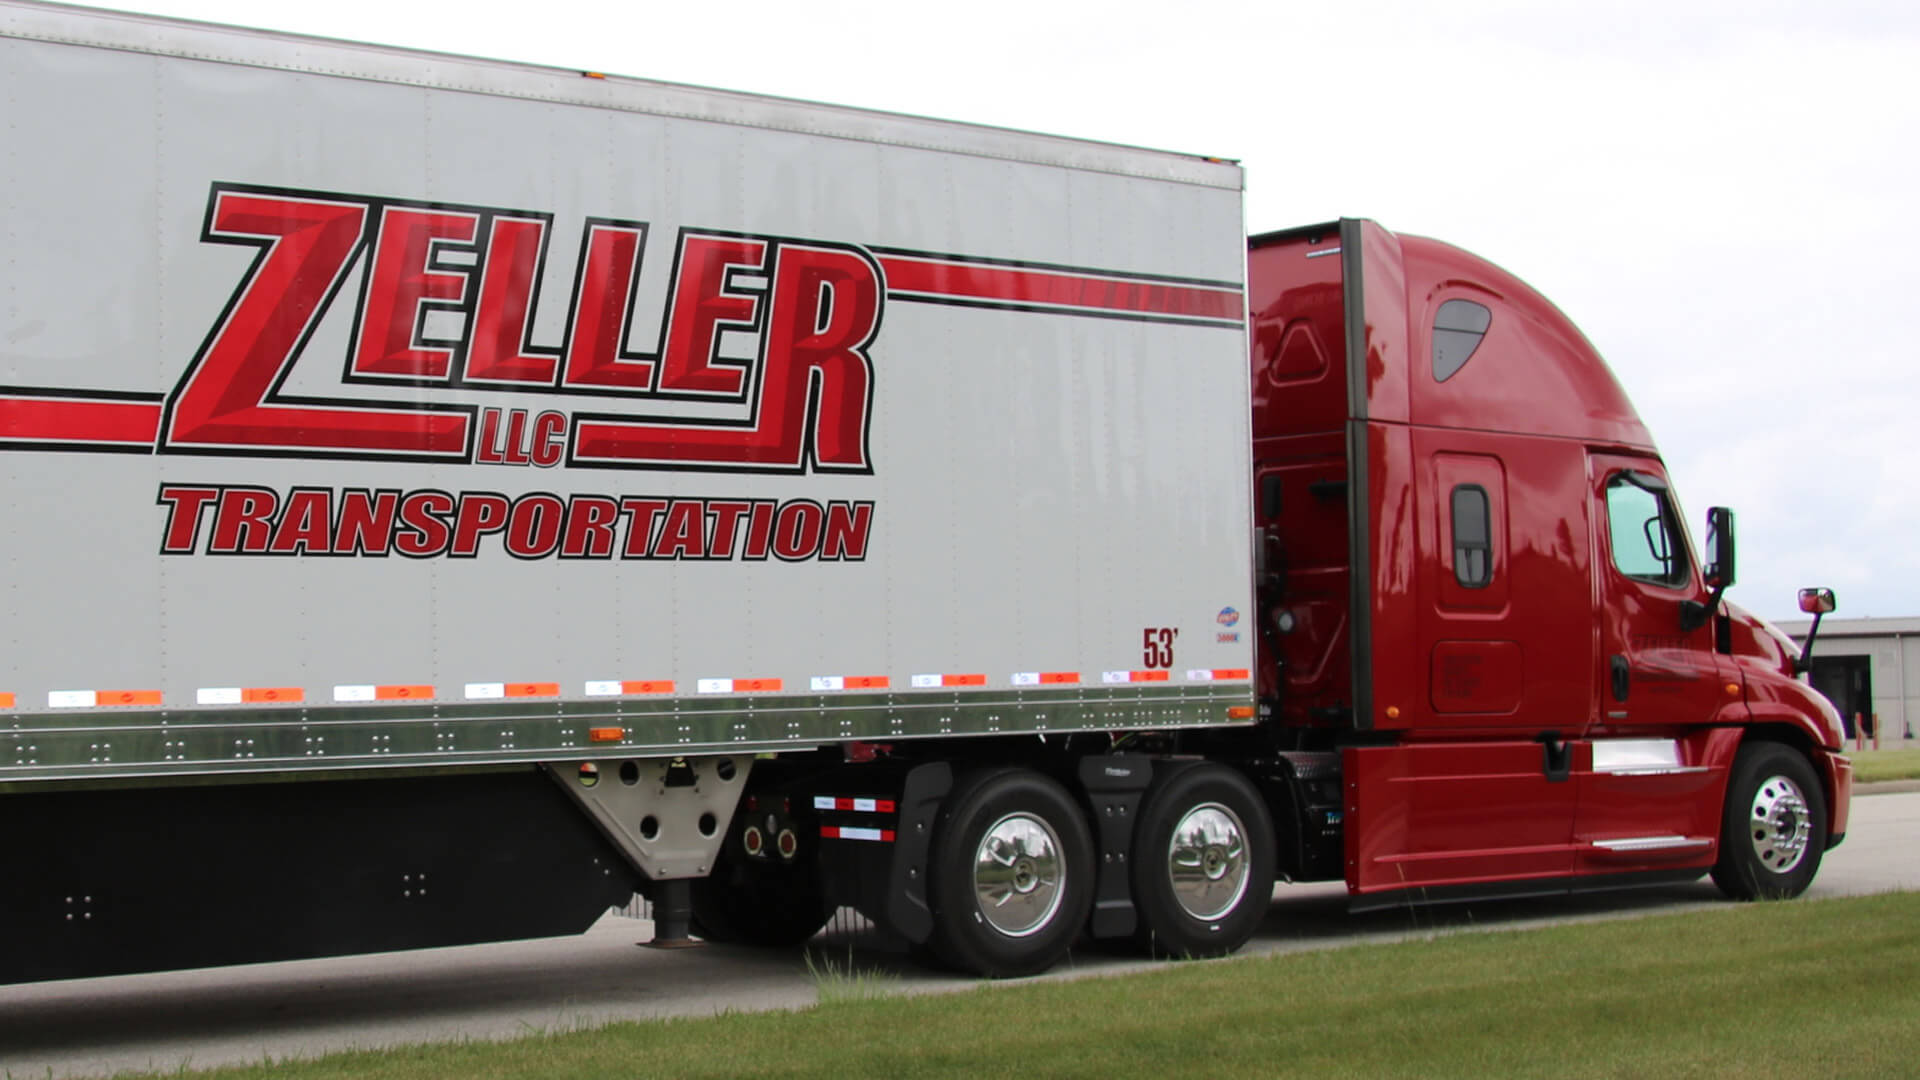 Zeller Transportation